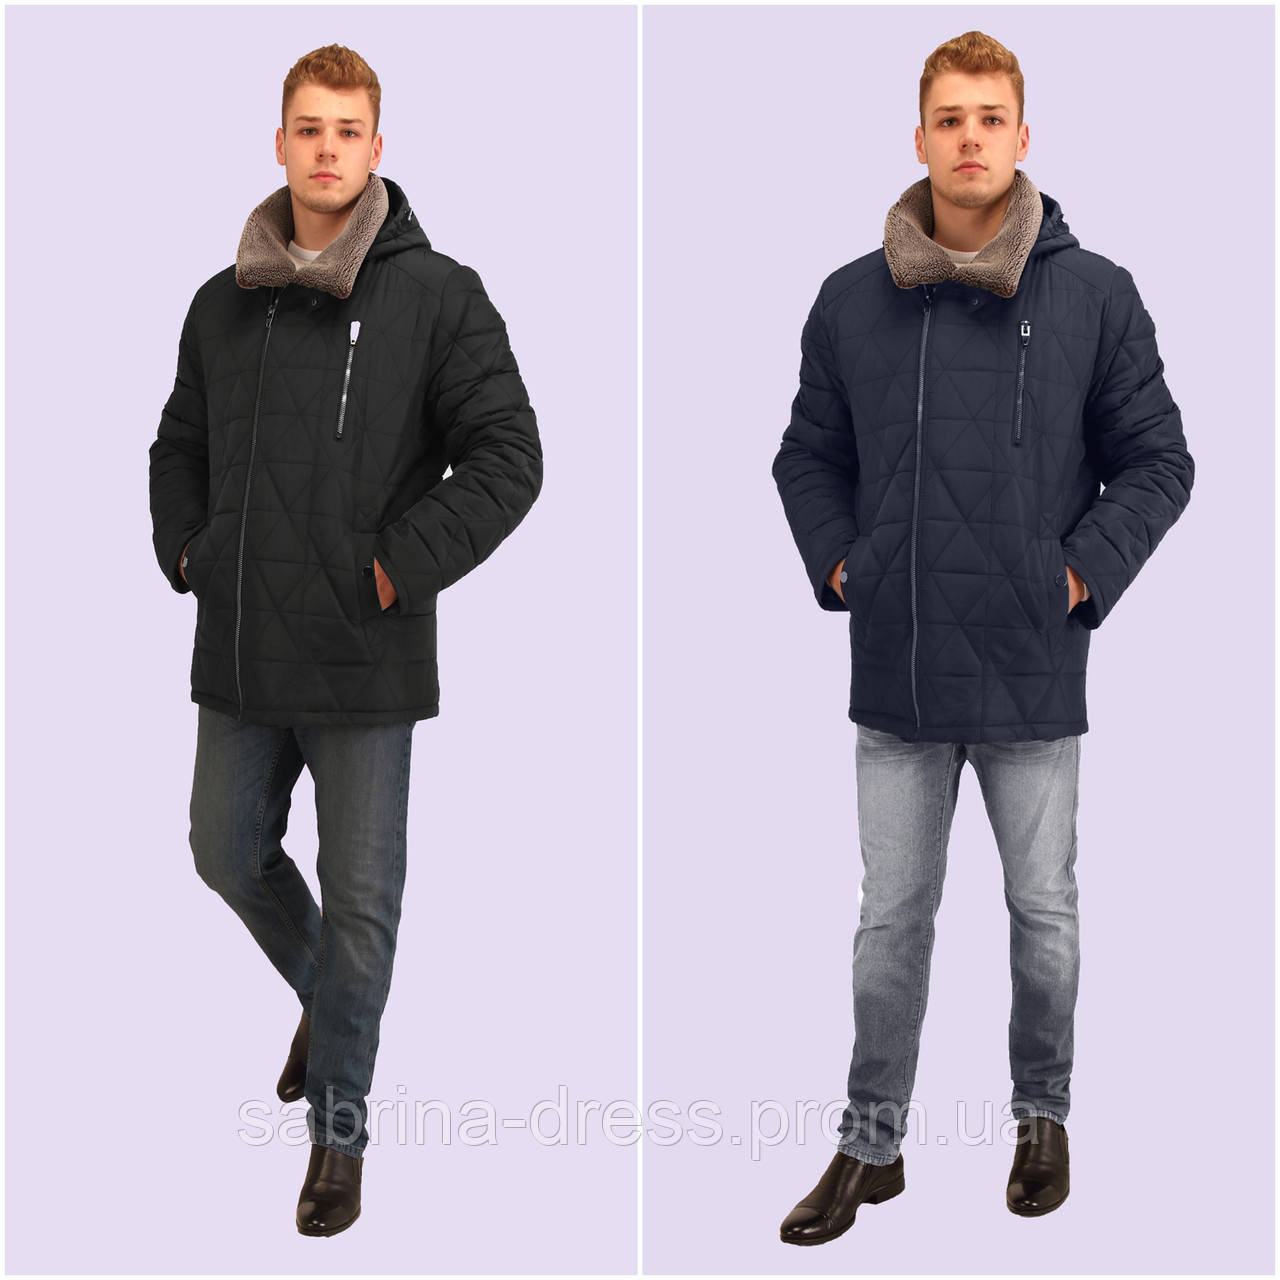 Куртка мужская зимняя. Модель 179. Размеры 48-60. Два цвета